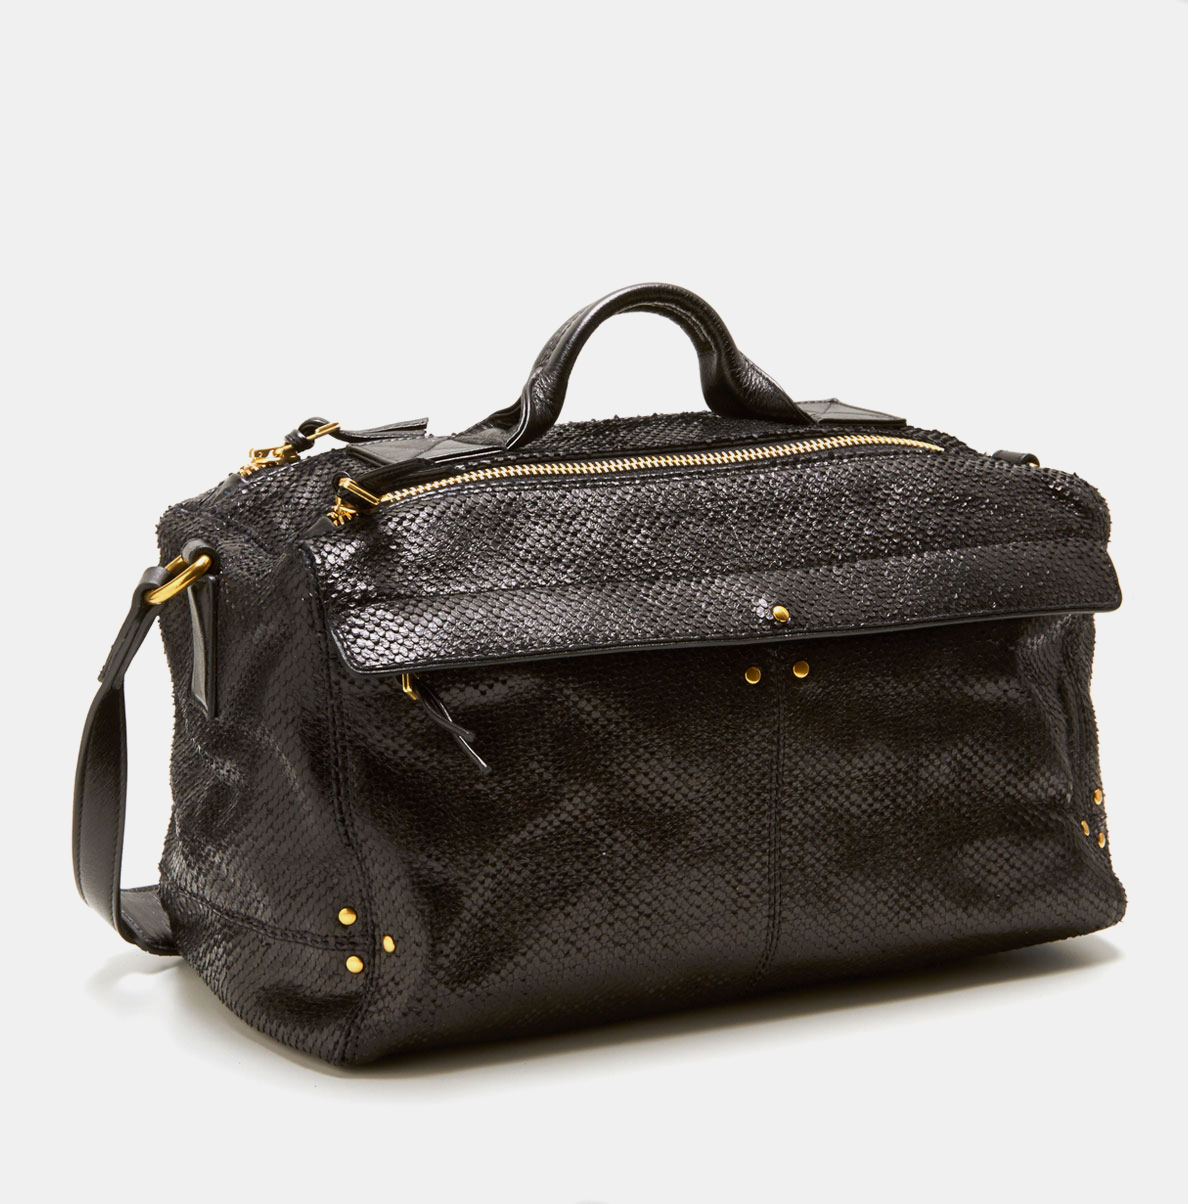 4784a045508 Jerome Dreyfuss Handbags - Handbag Photos Eleventyone.Org